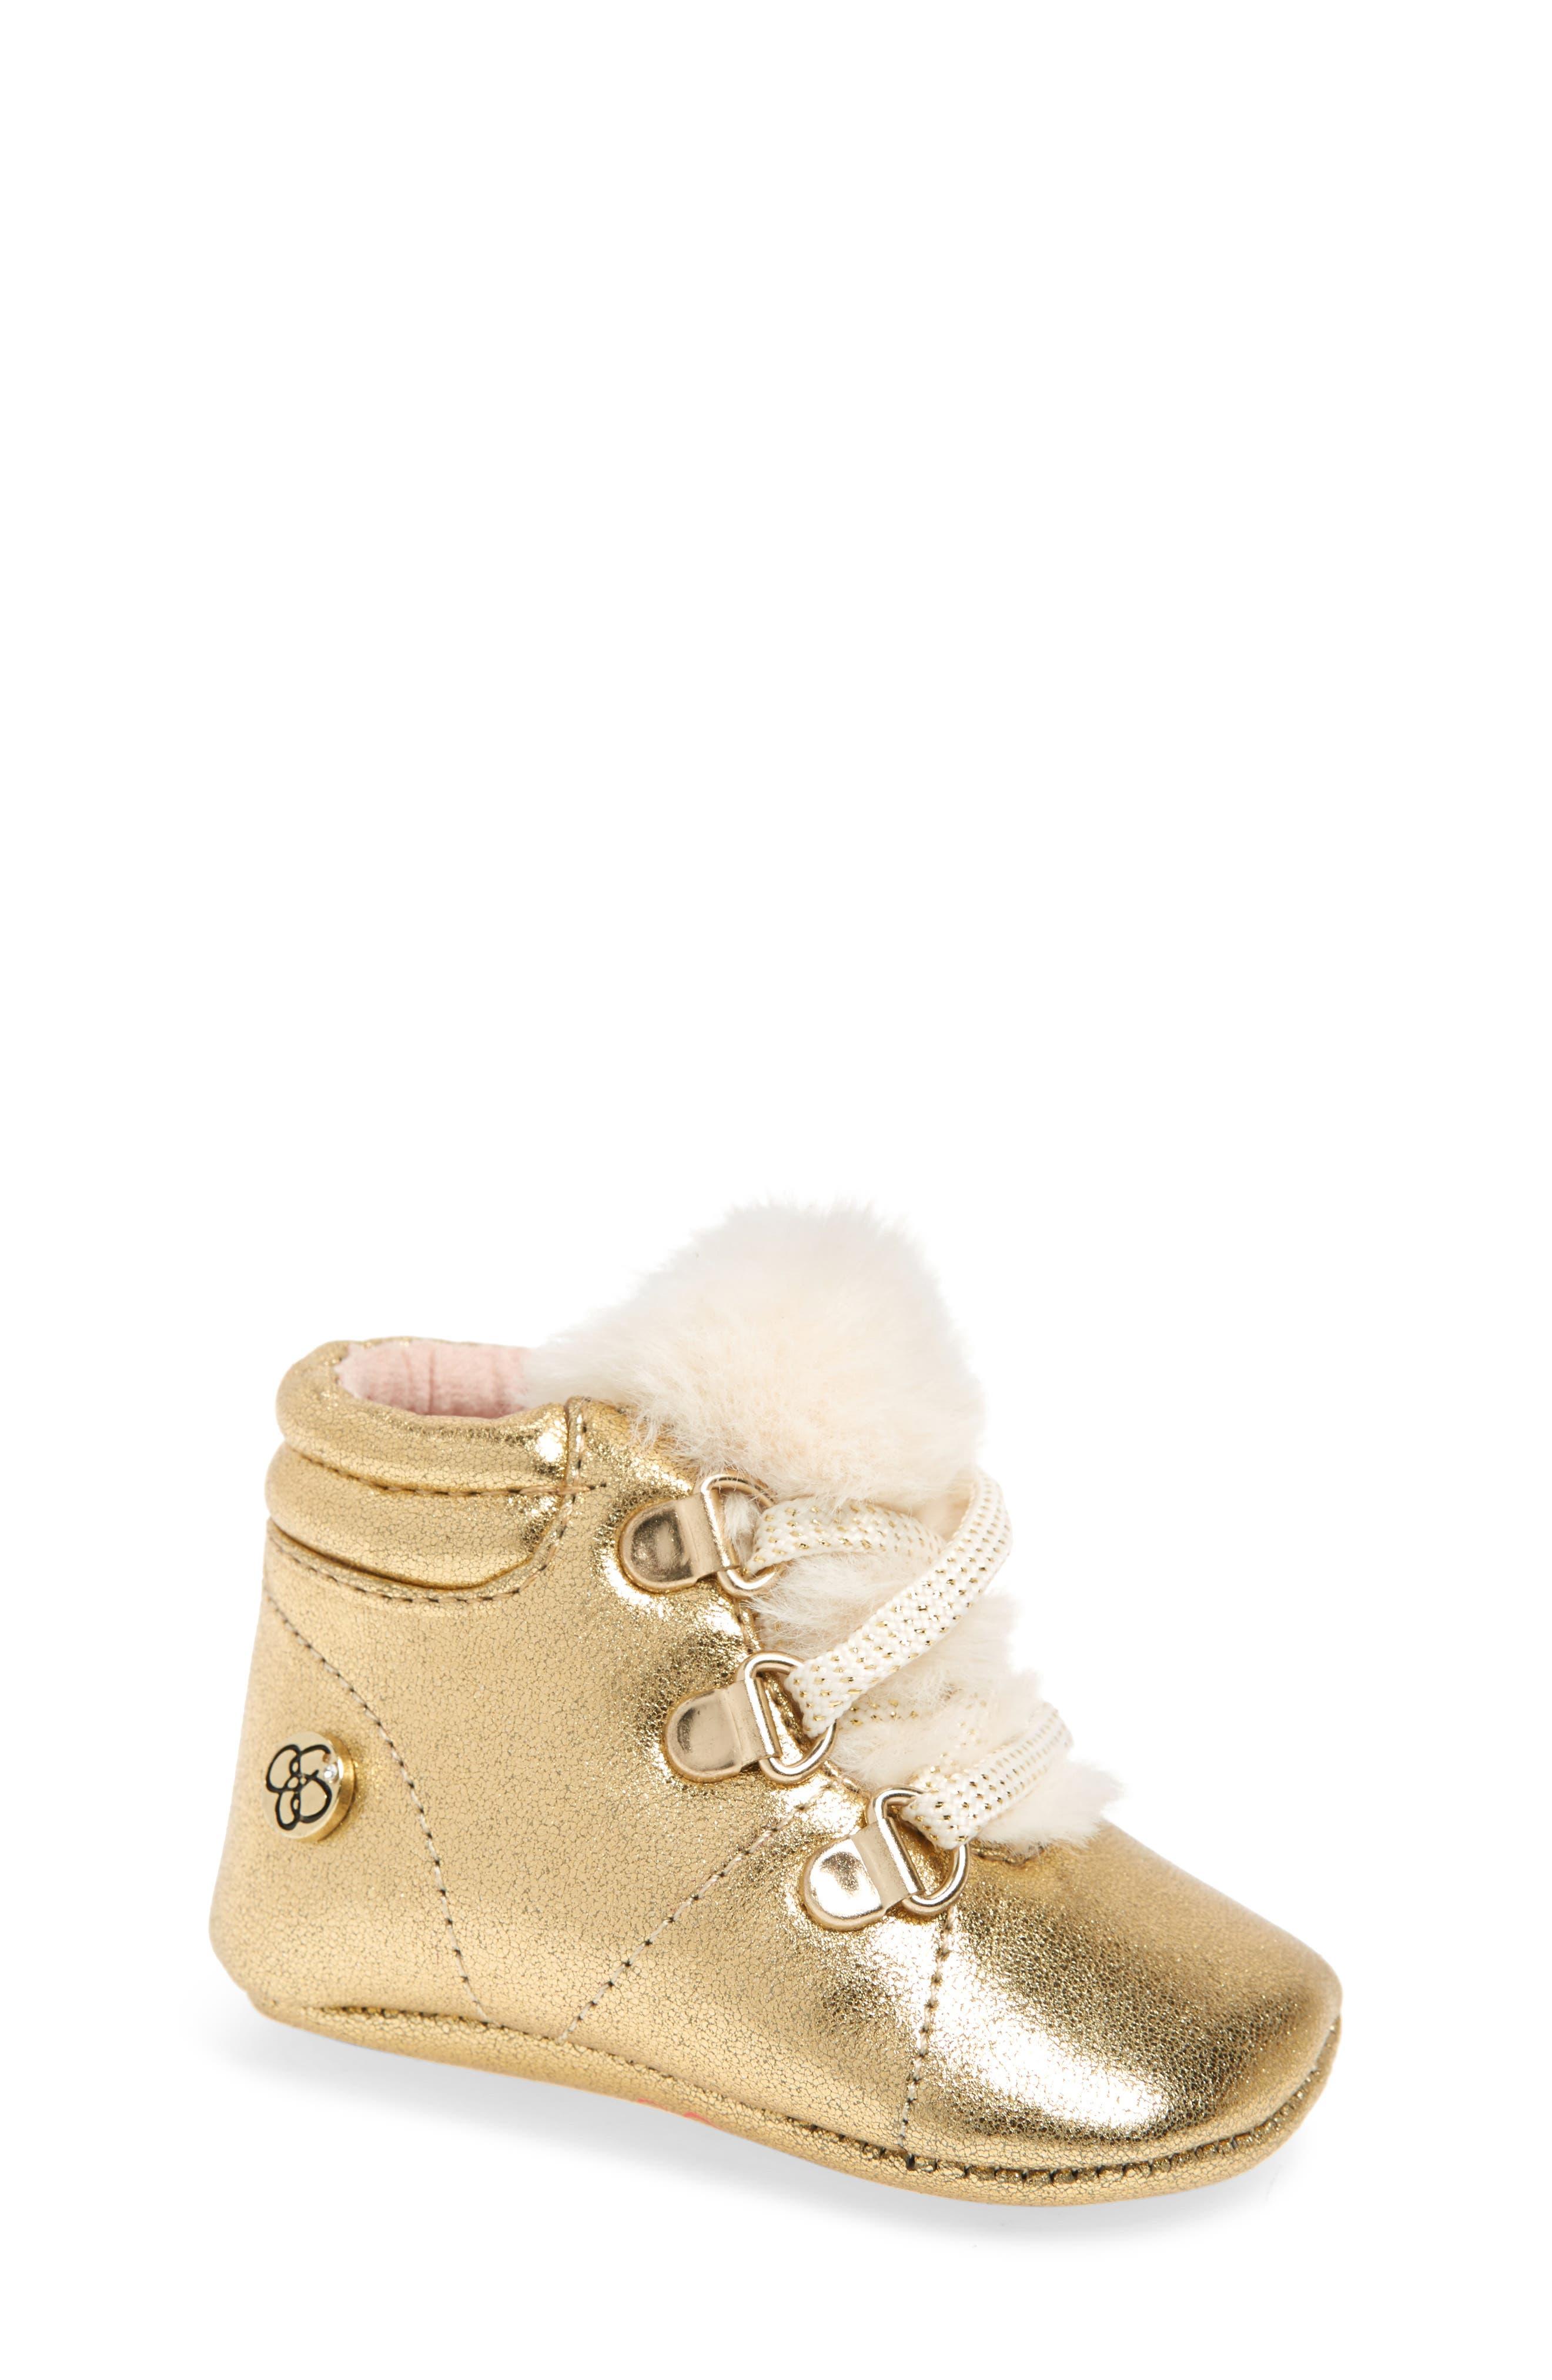 Faux Fur Metallic Crib Sneaker,                             Main thumbnail 1, color,                             GOLD CRACKLE METALLIC